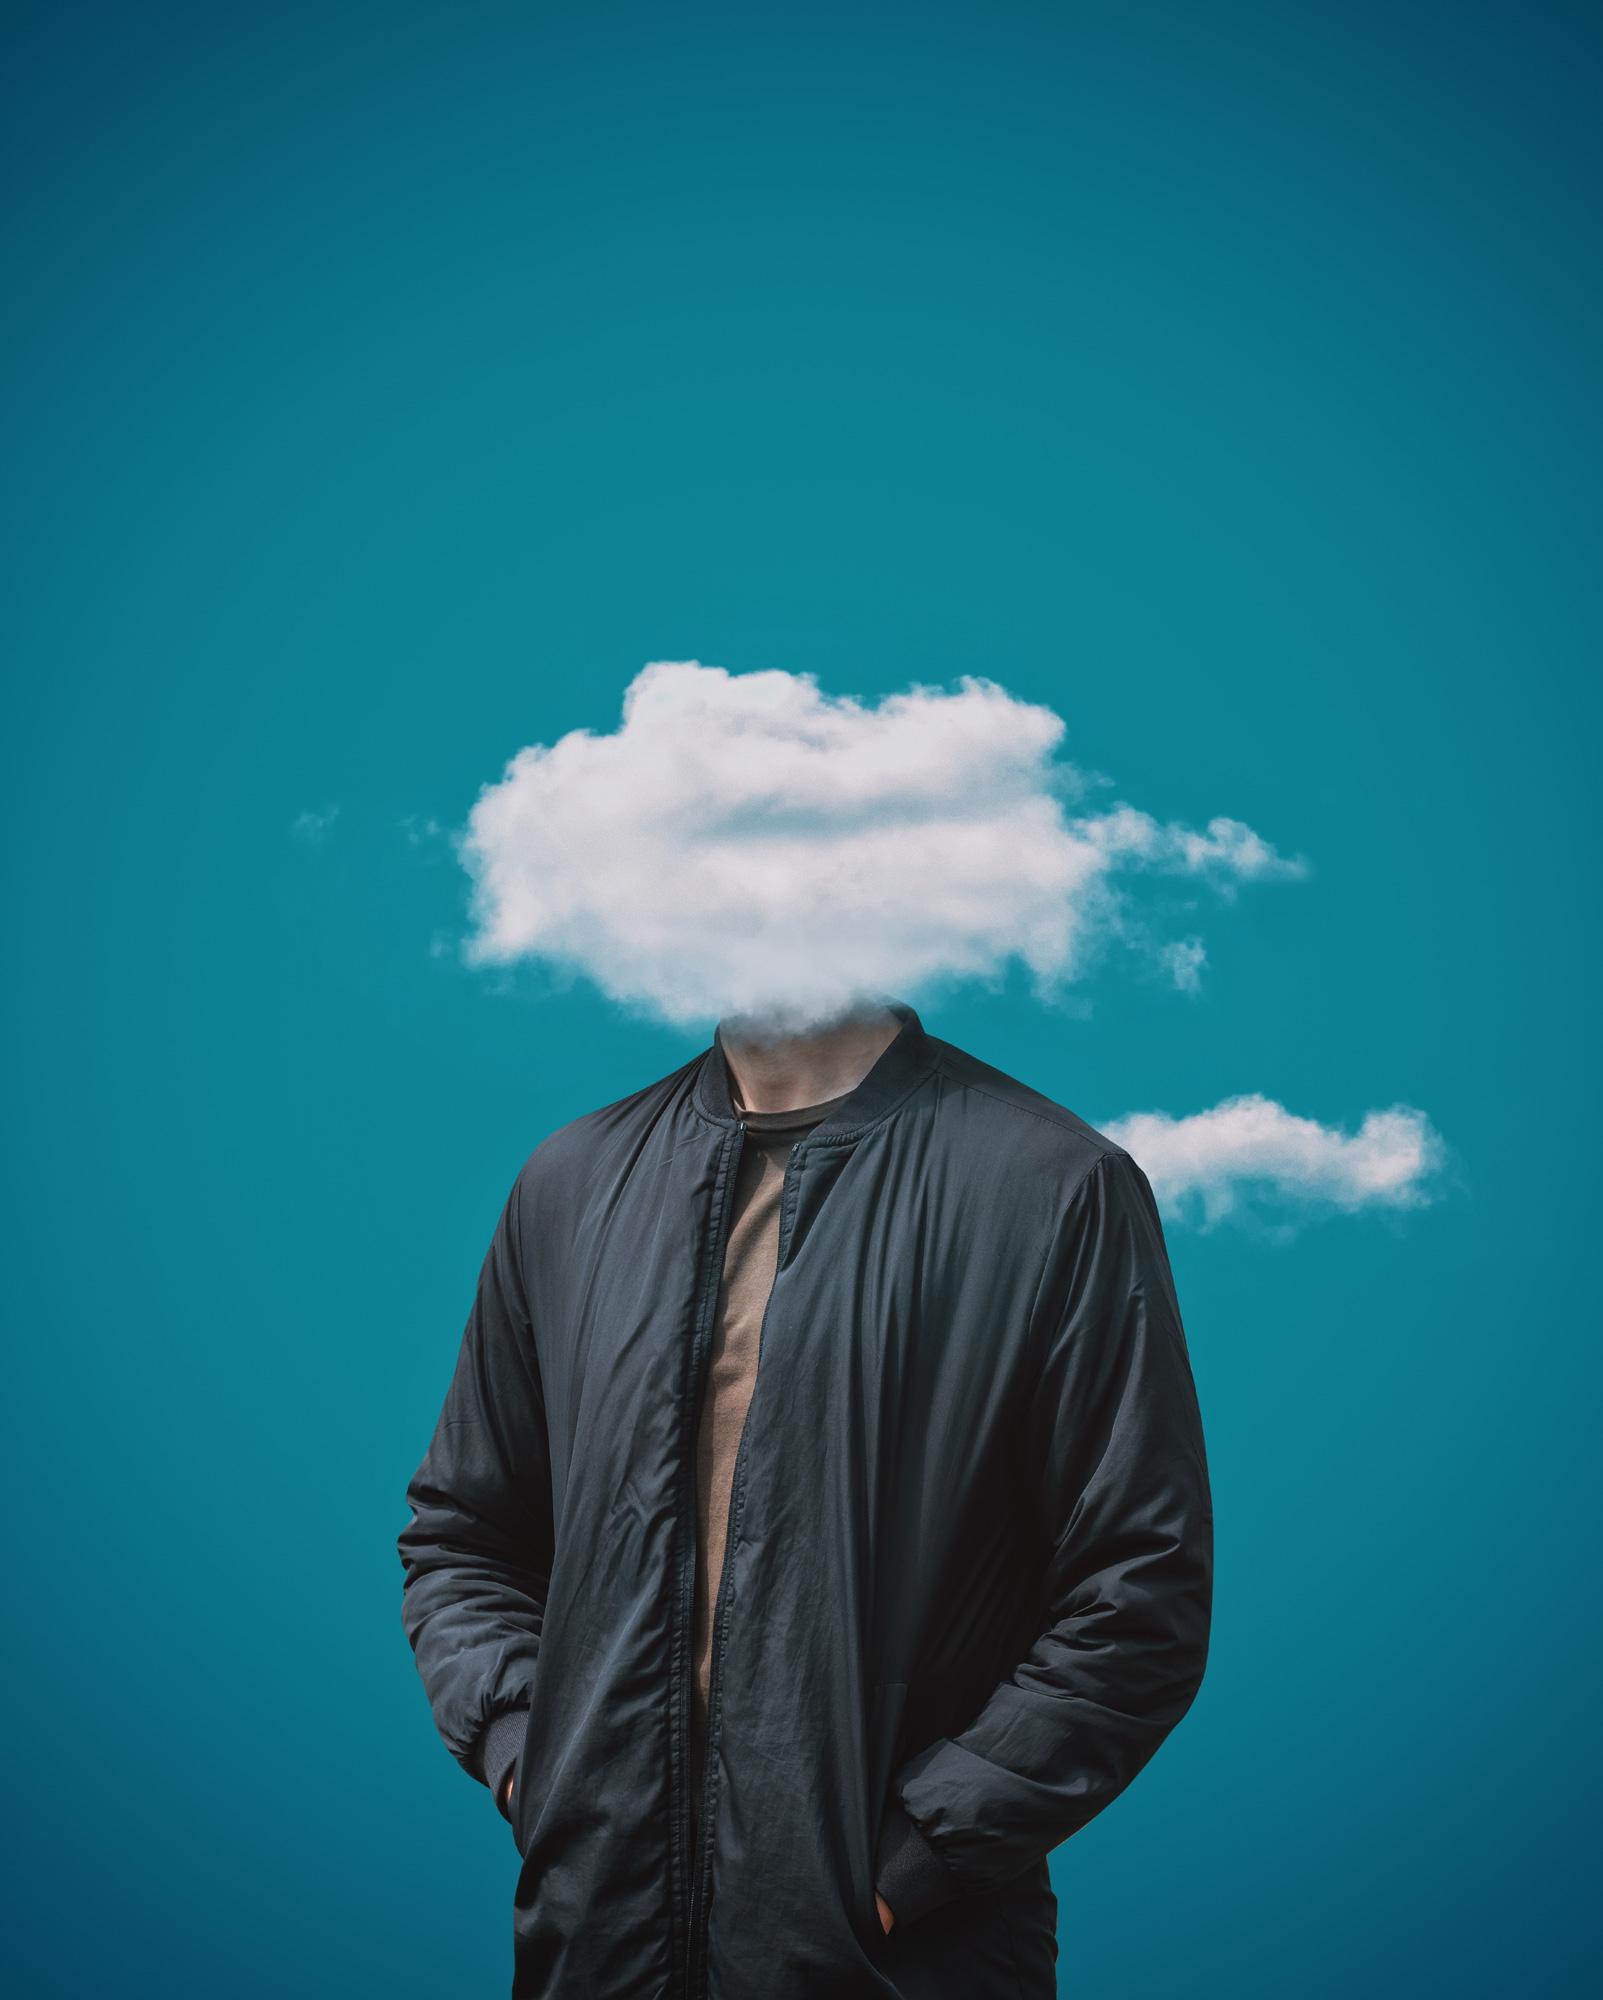 cloud-head.jpg